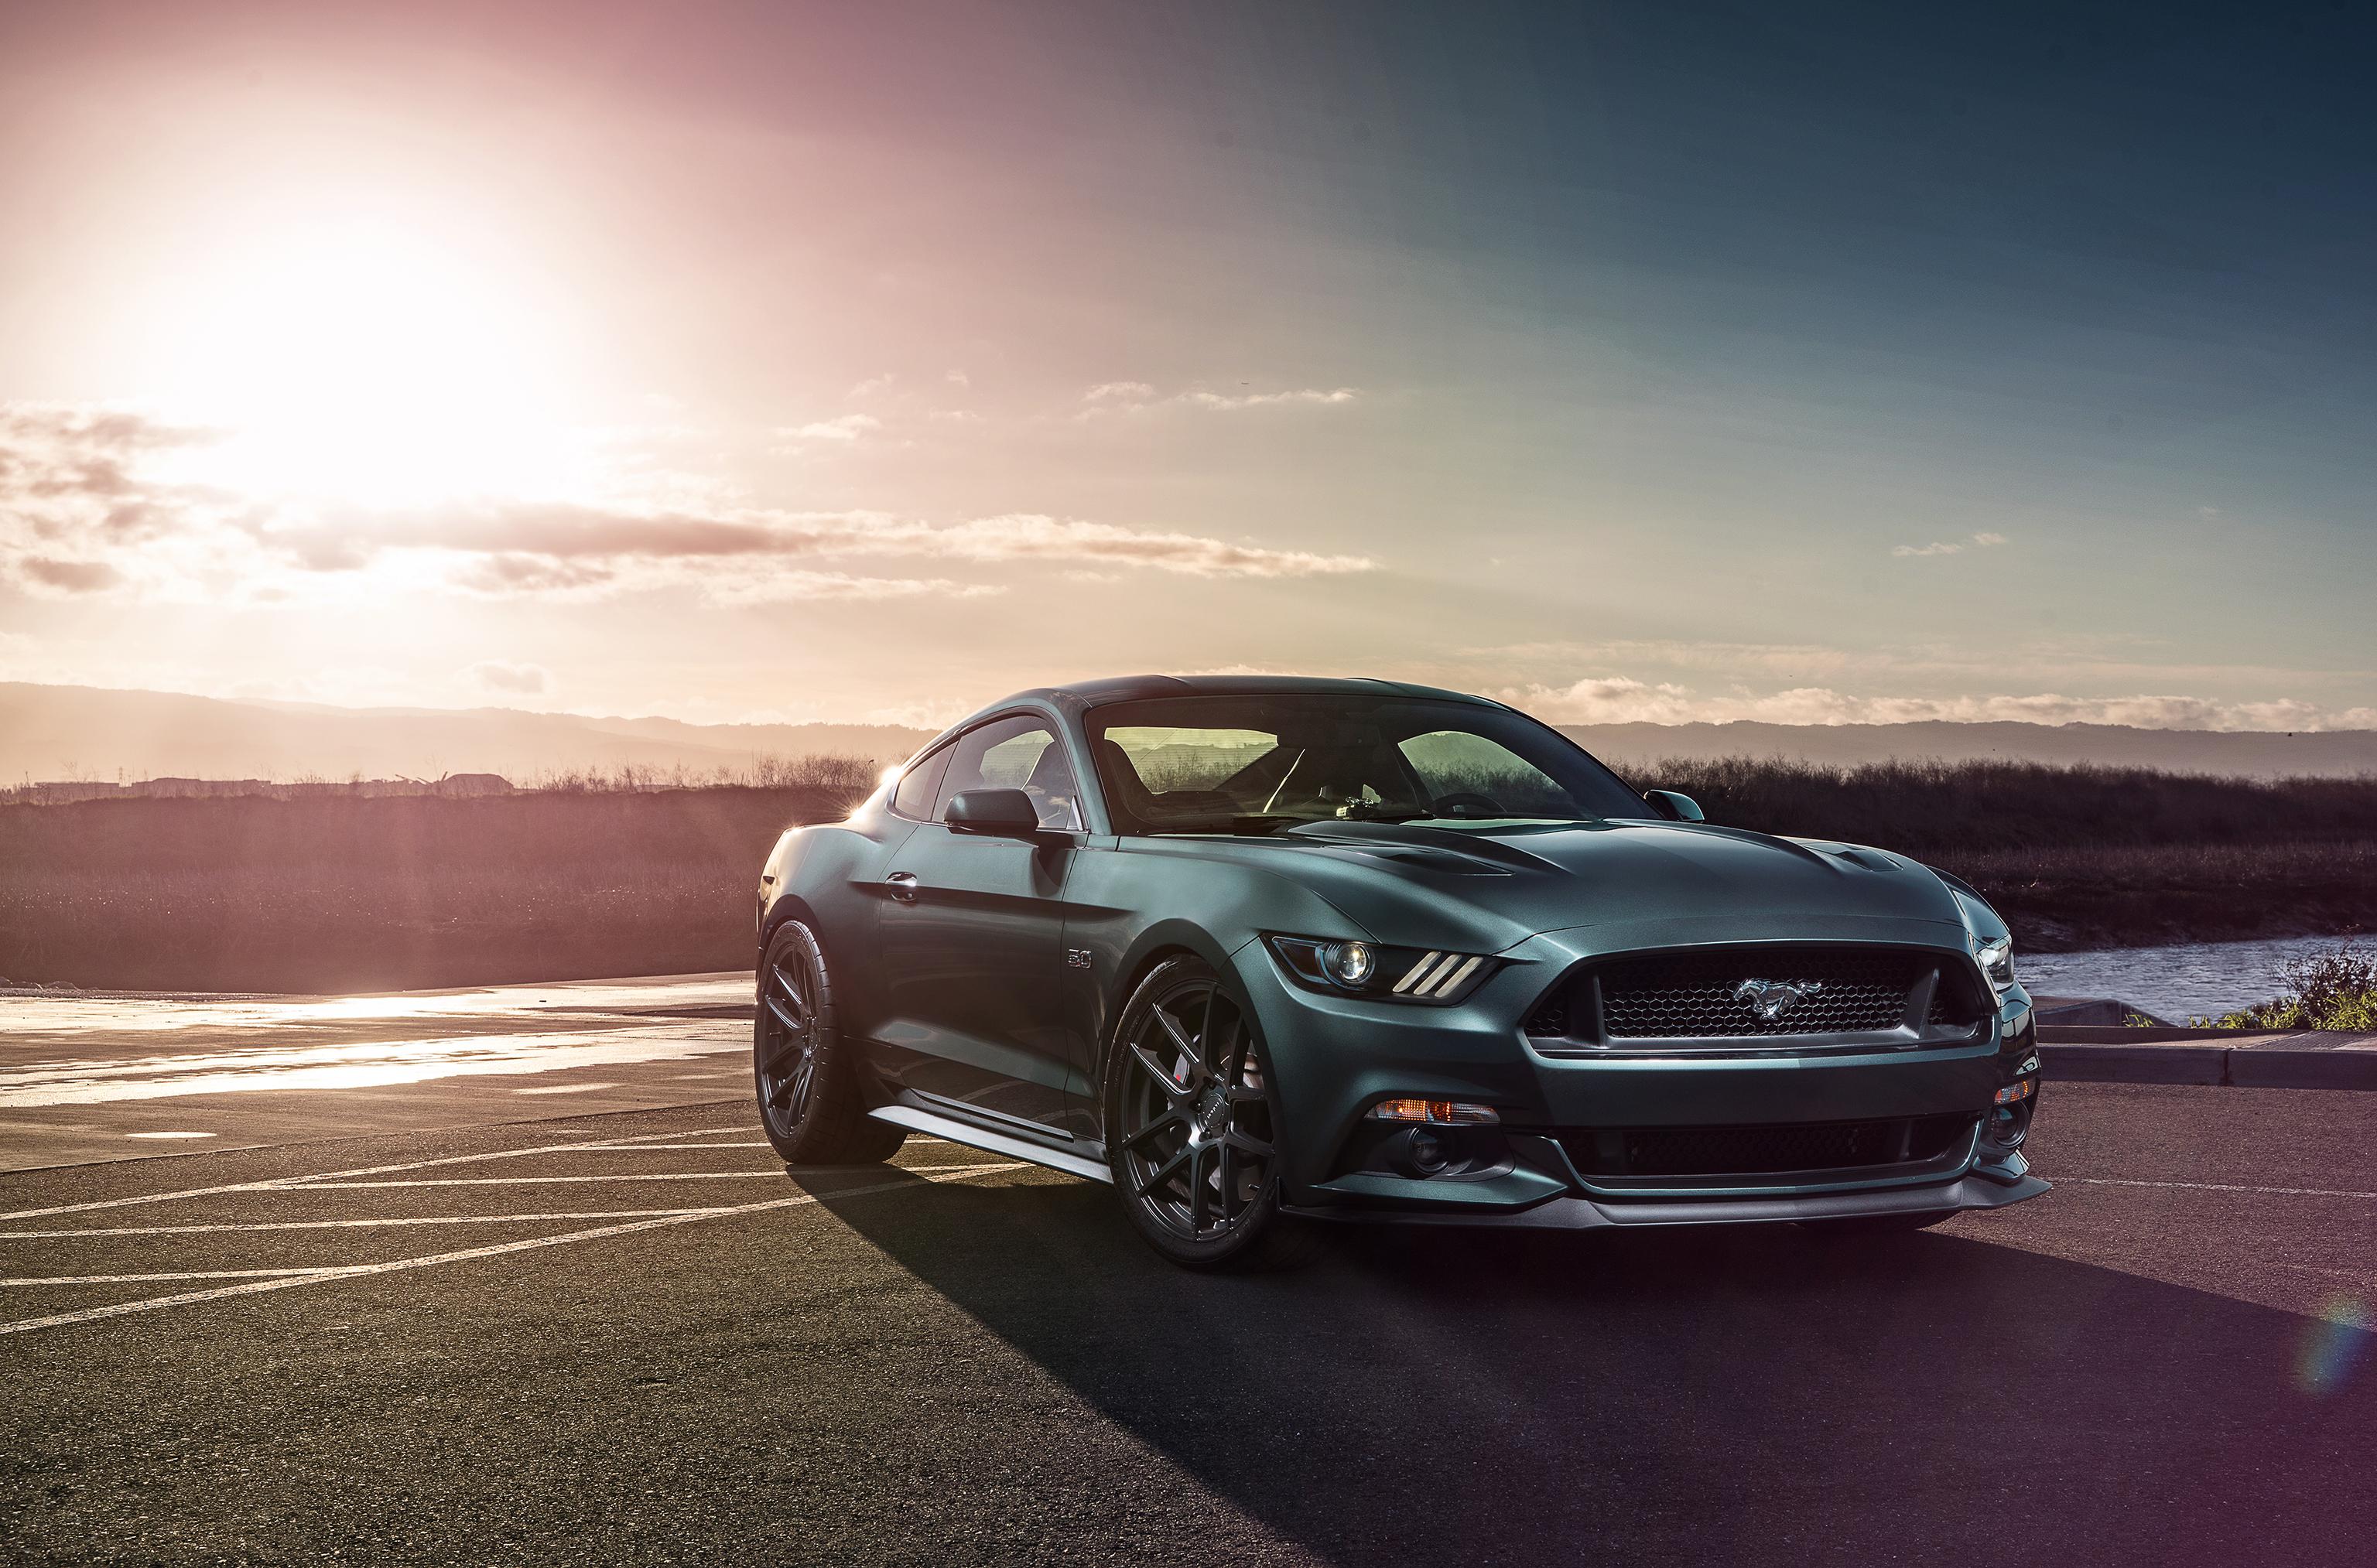 140938 скачать обои Форд (Ford), Тачки (Cars), Спорткар, Вид Сбоку, Ford Mustang Gt - заставки и картинки бесплатно